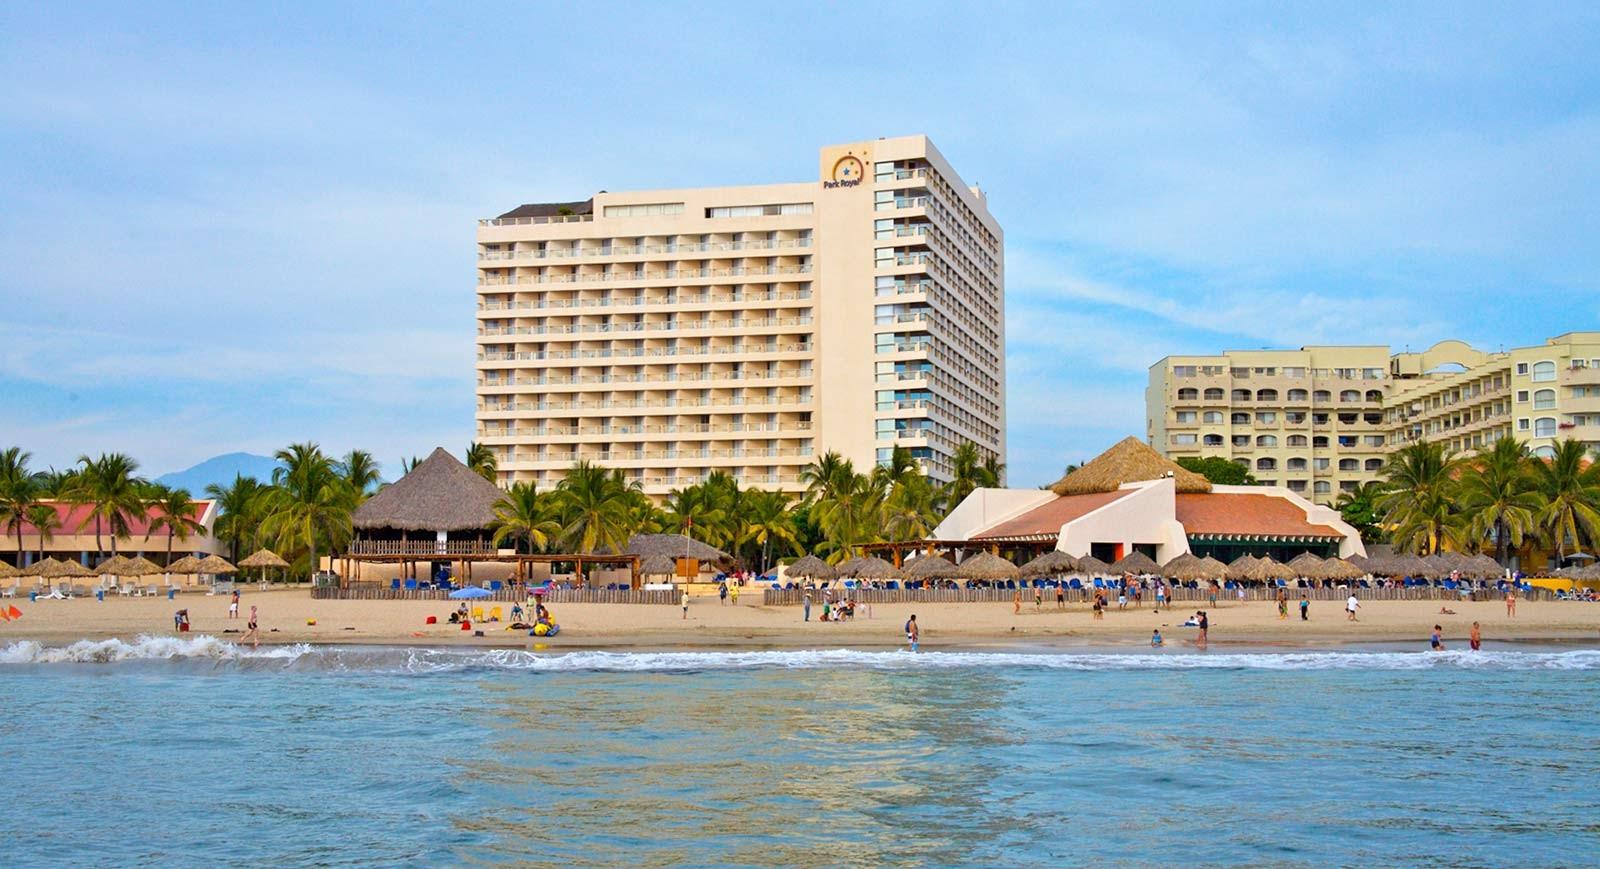 Panoramica del hotel Park Royal Ixtapa